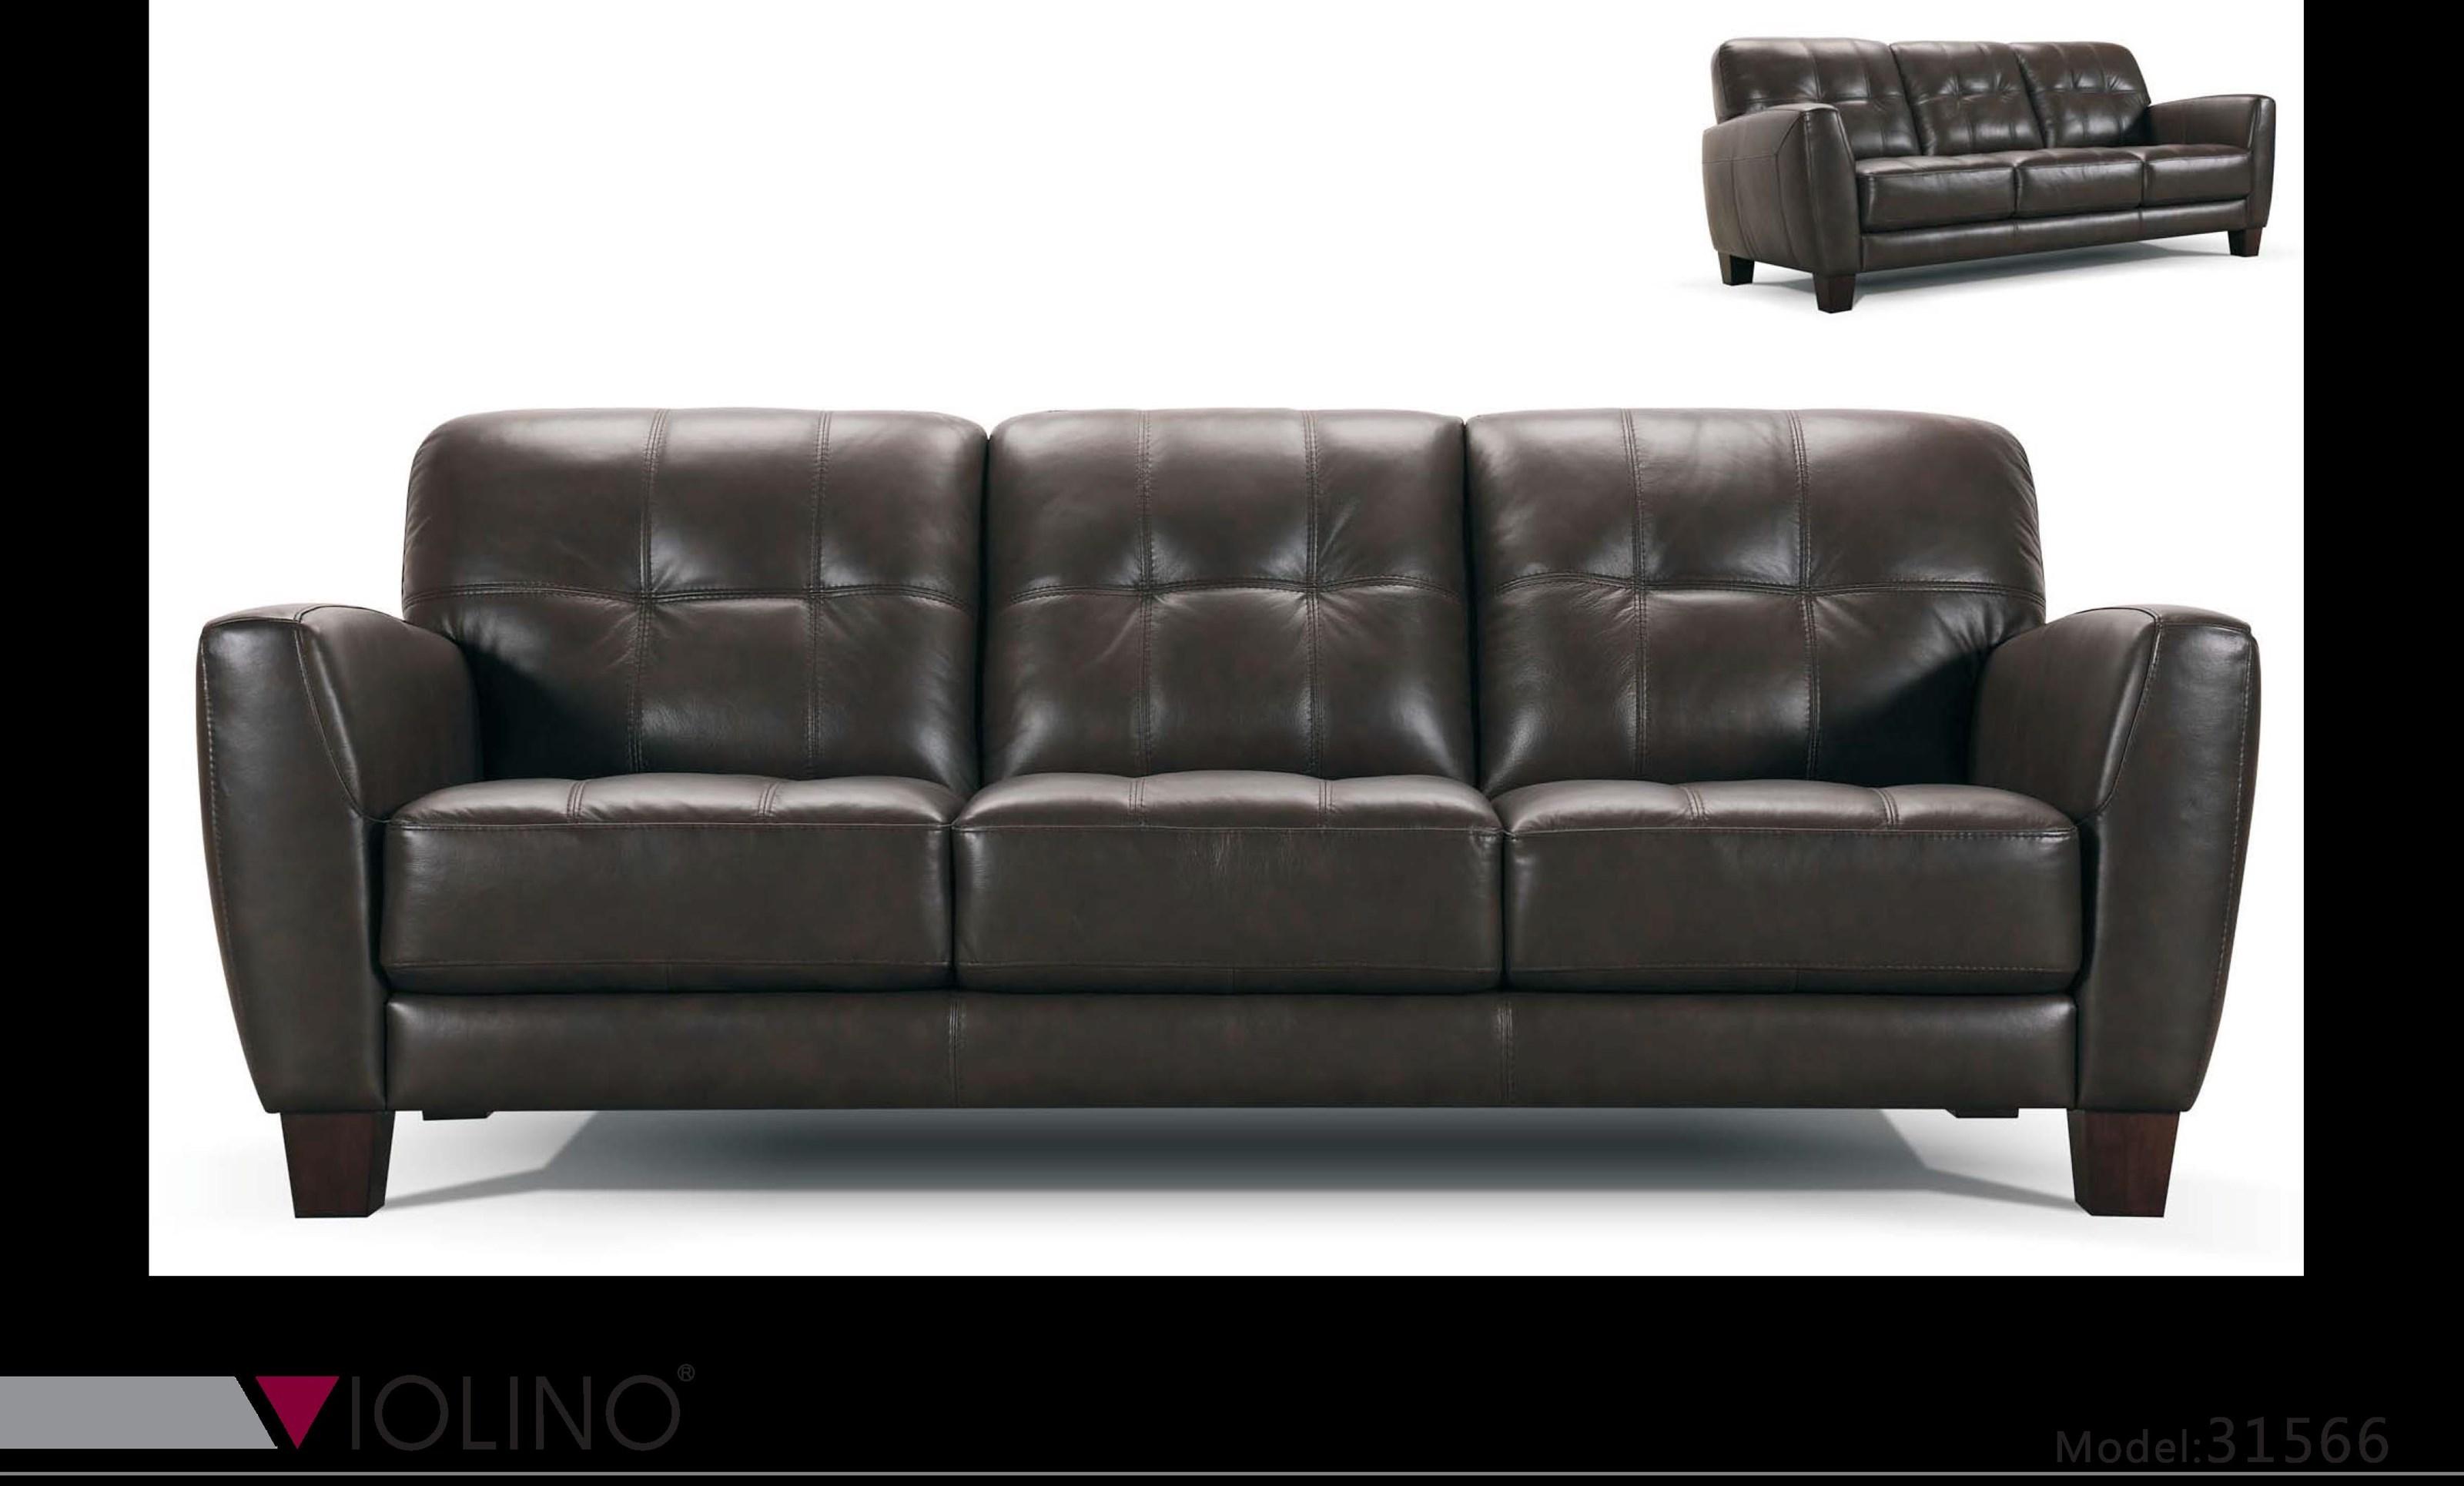 31566 Tufted Leather Sofa by Violino at O'Dunk & O'Bright Furniture